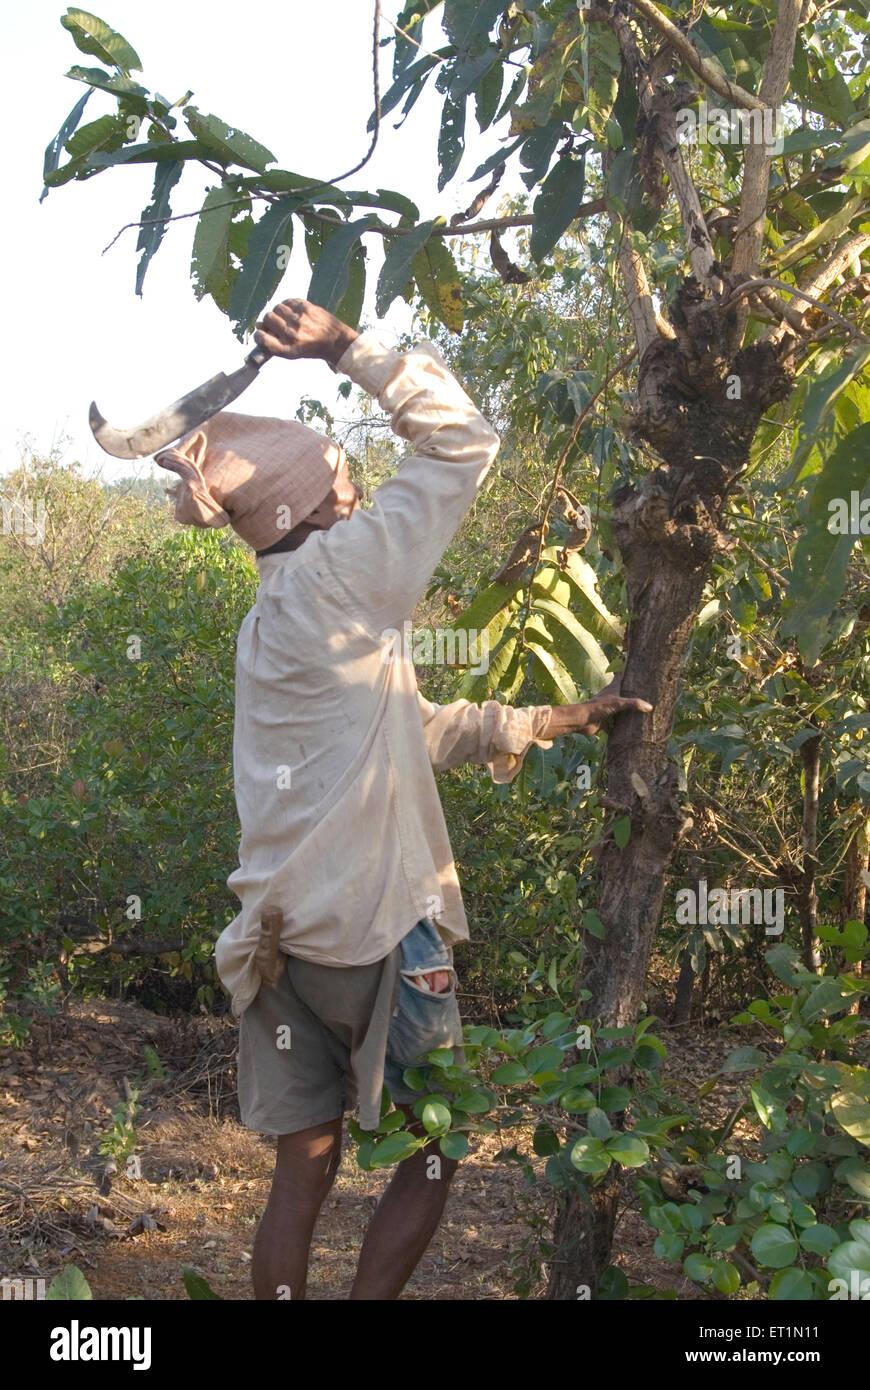 Man cutting tree for local use with help of sickle at Lanja village ; district Ratnagiri ; Maharashtra ; India - Stock Image